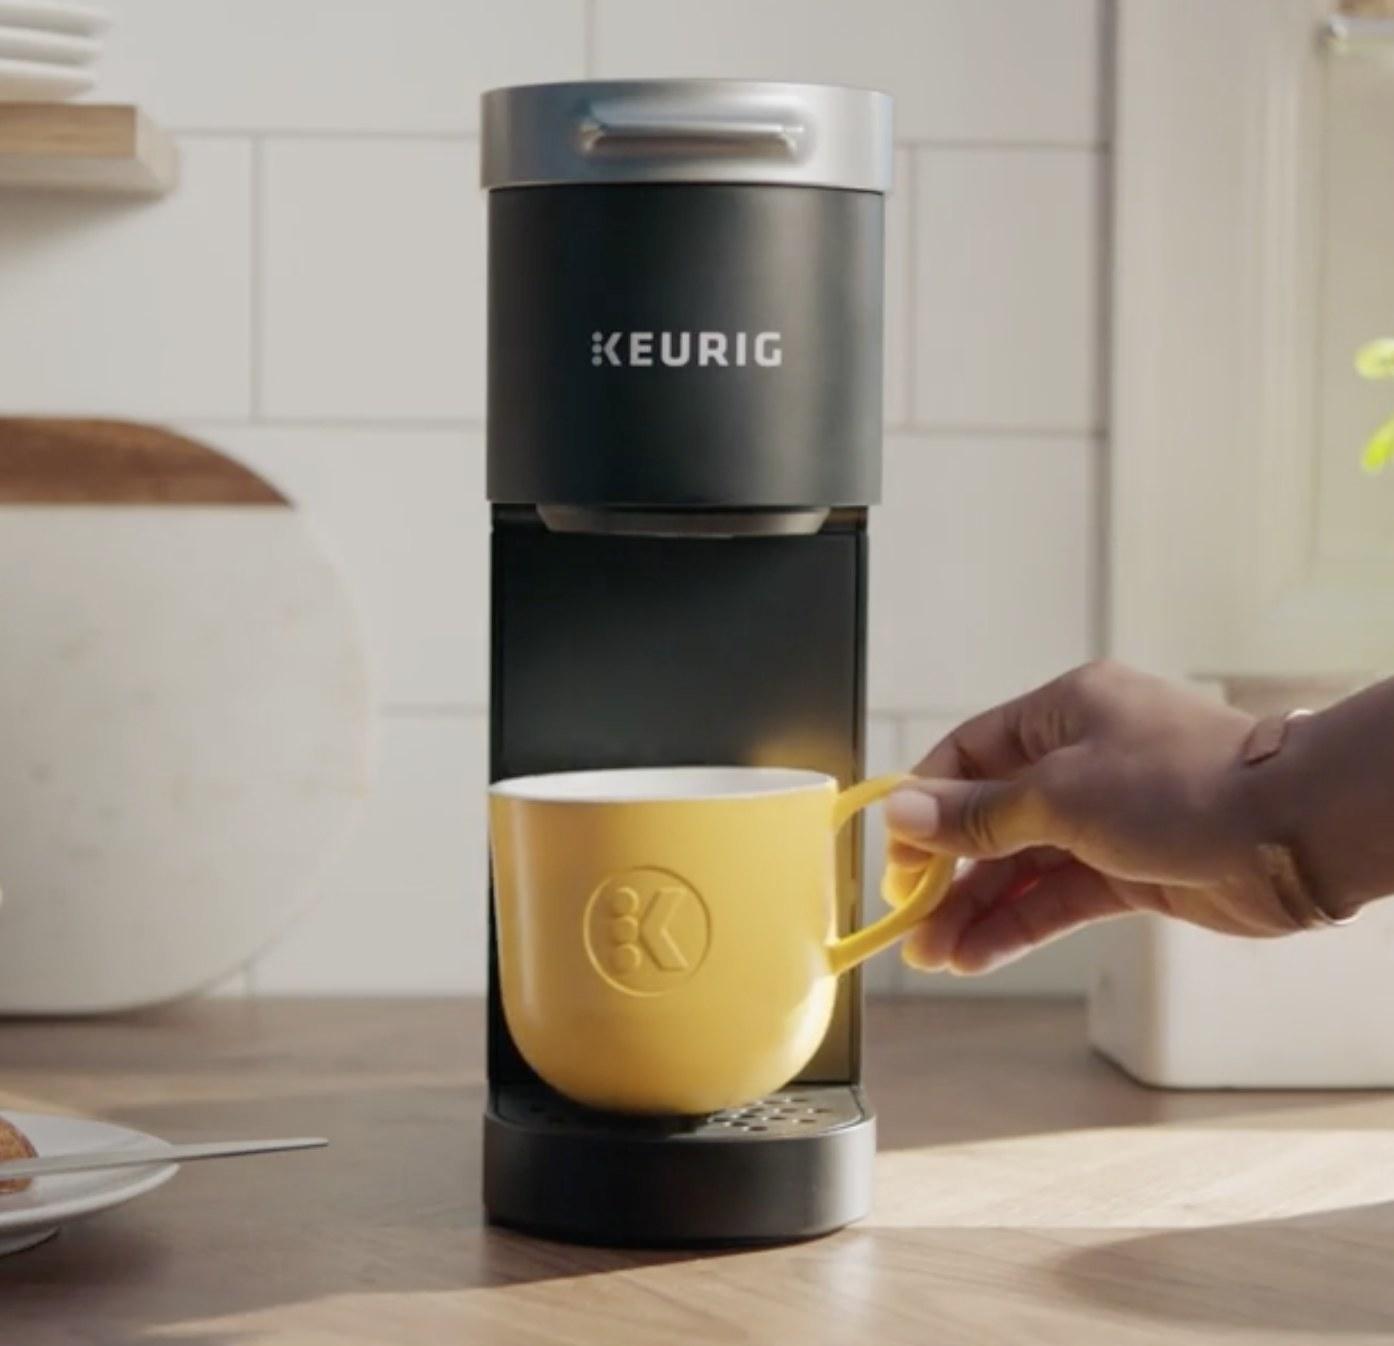 Person is placing a yellow mug on a black Keurig mini coffee maker